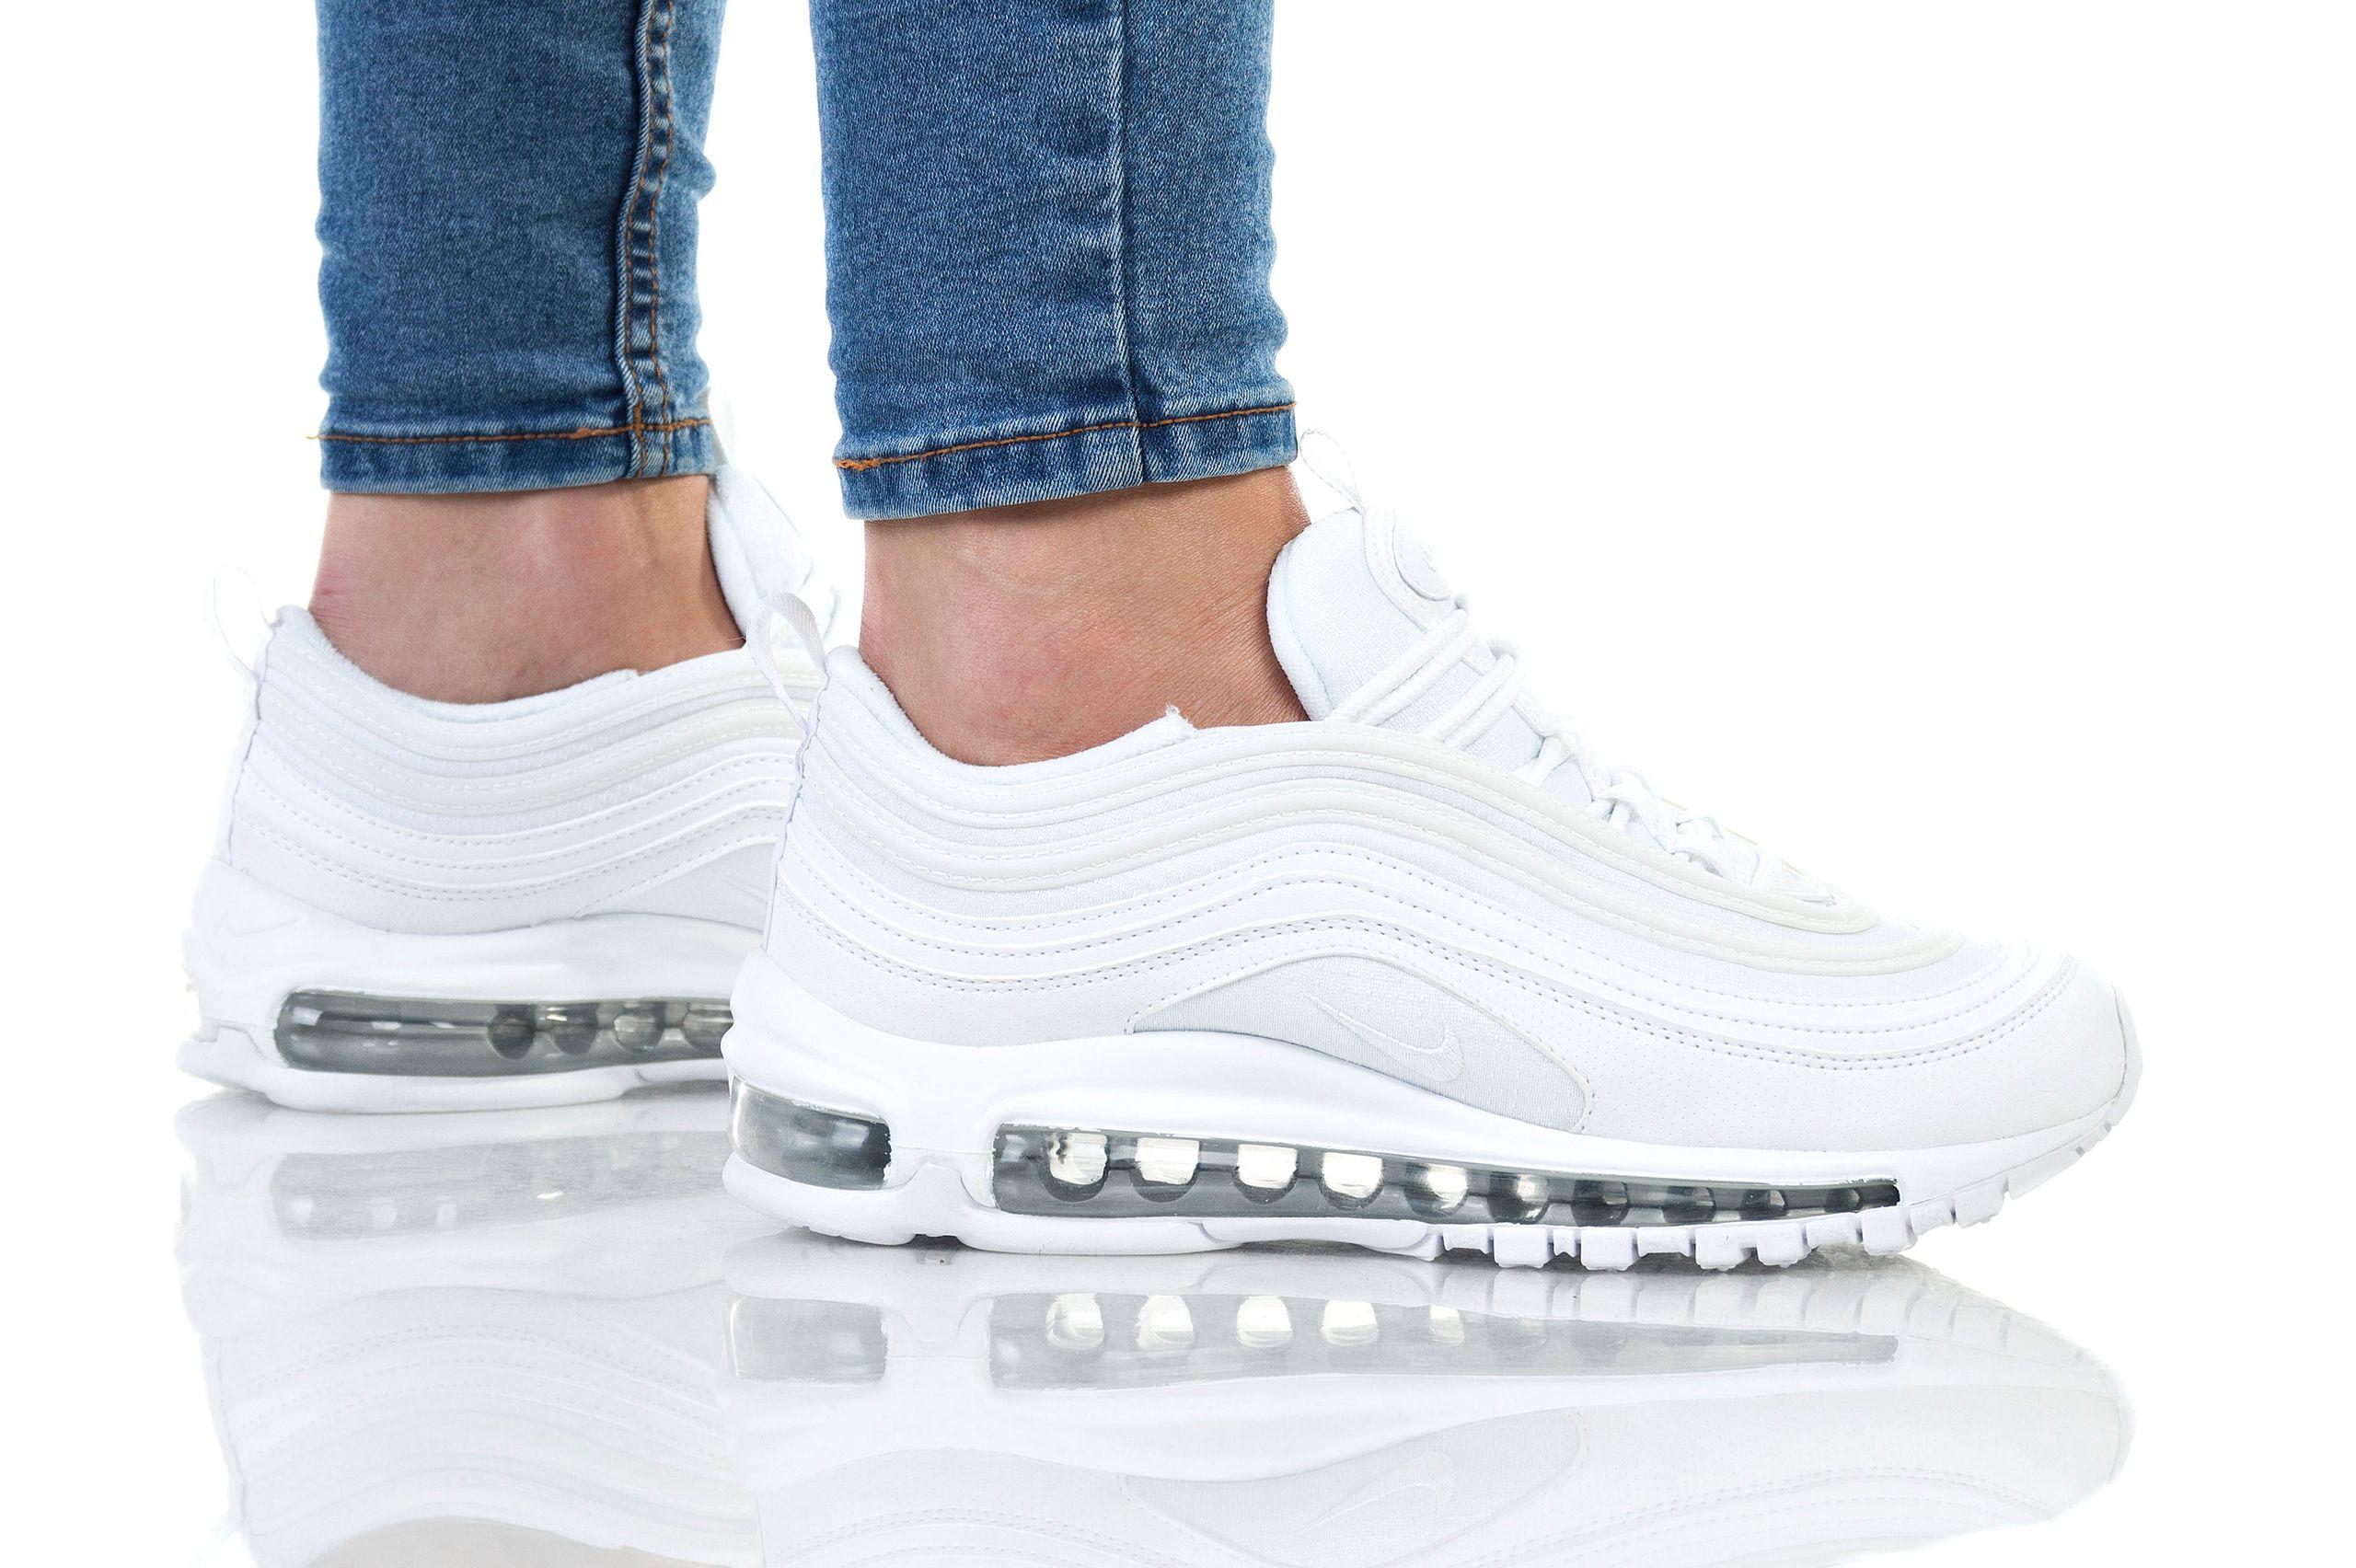 Bottes Nike AIR MAX 97 (GS) 921522-104 | immi b2b